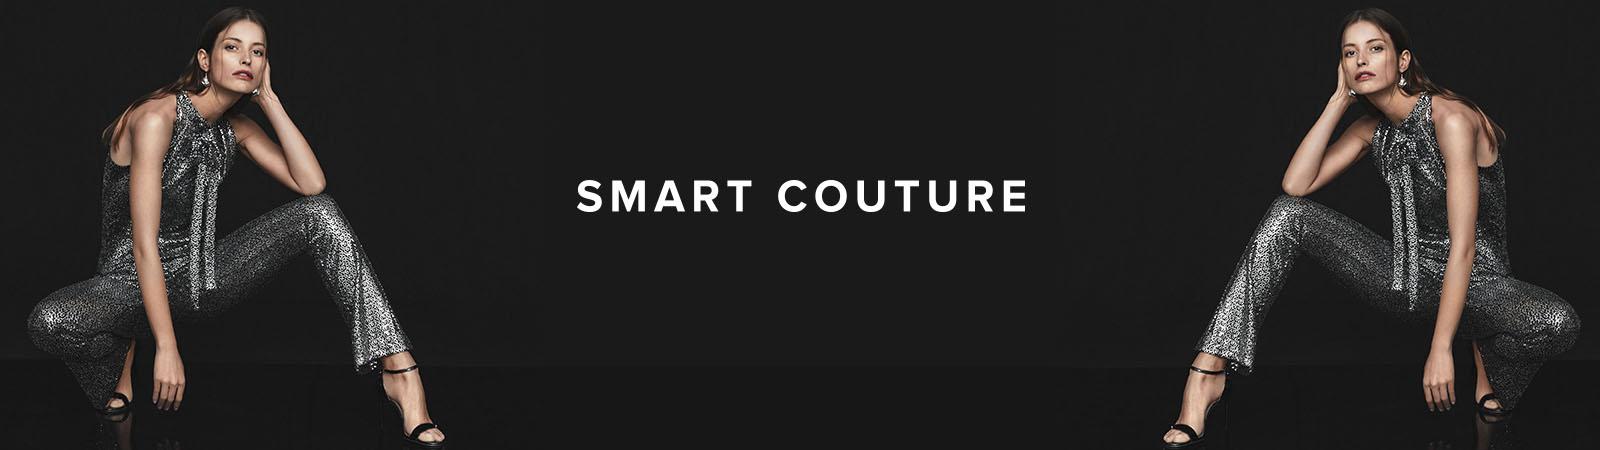 Motivi -Smart Couture